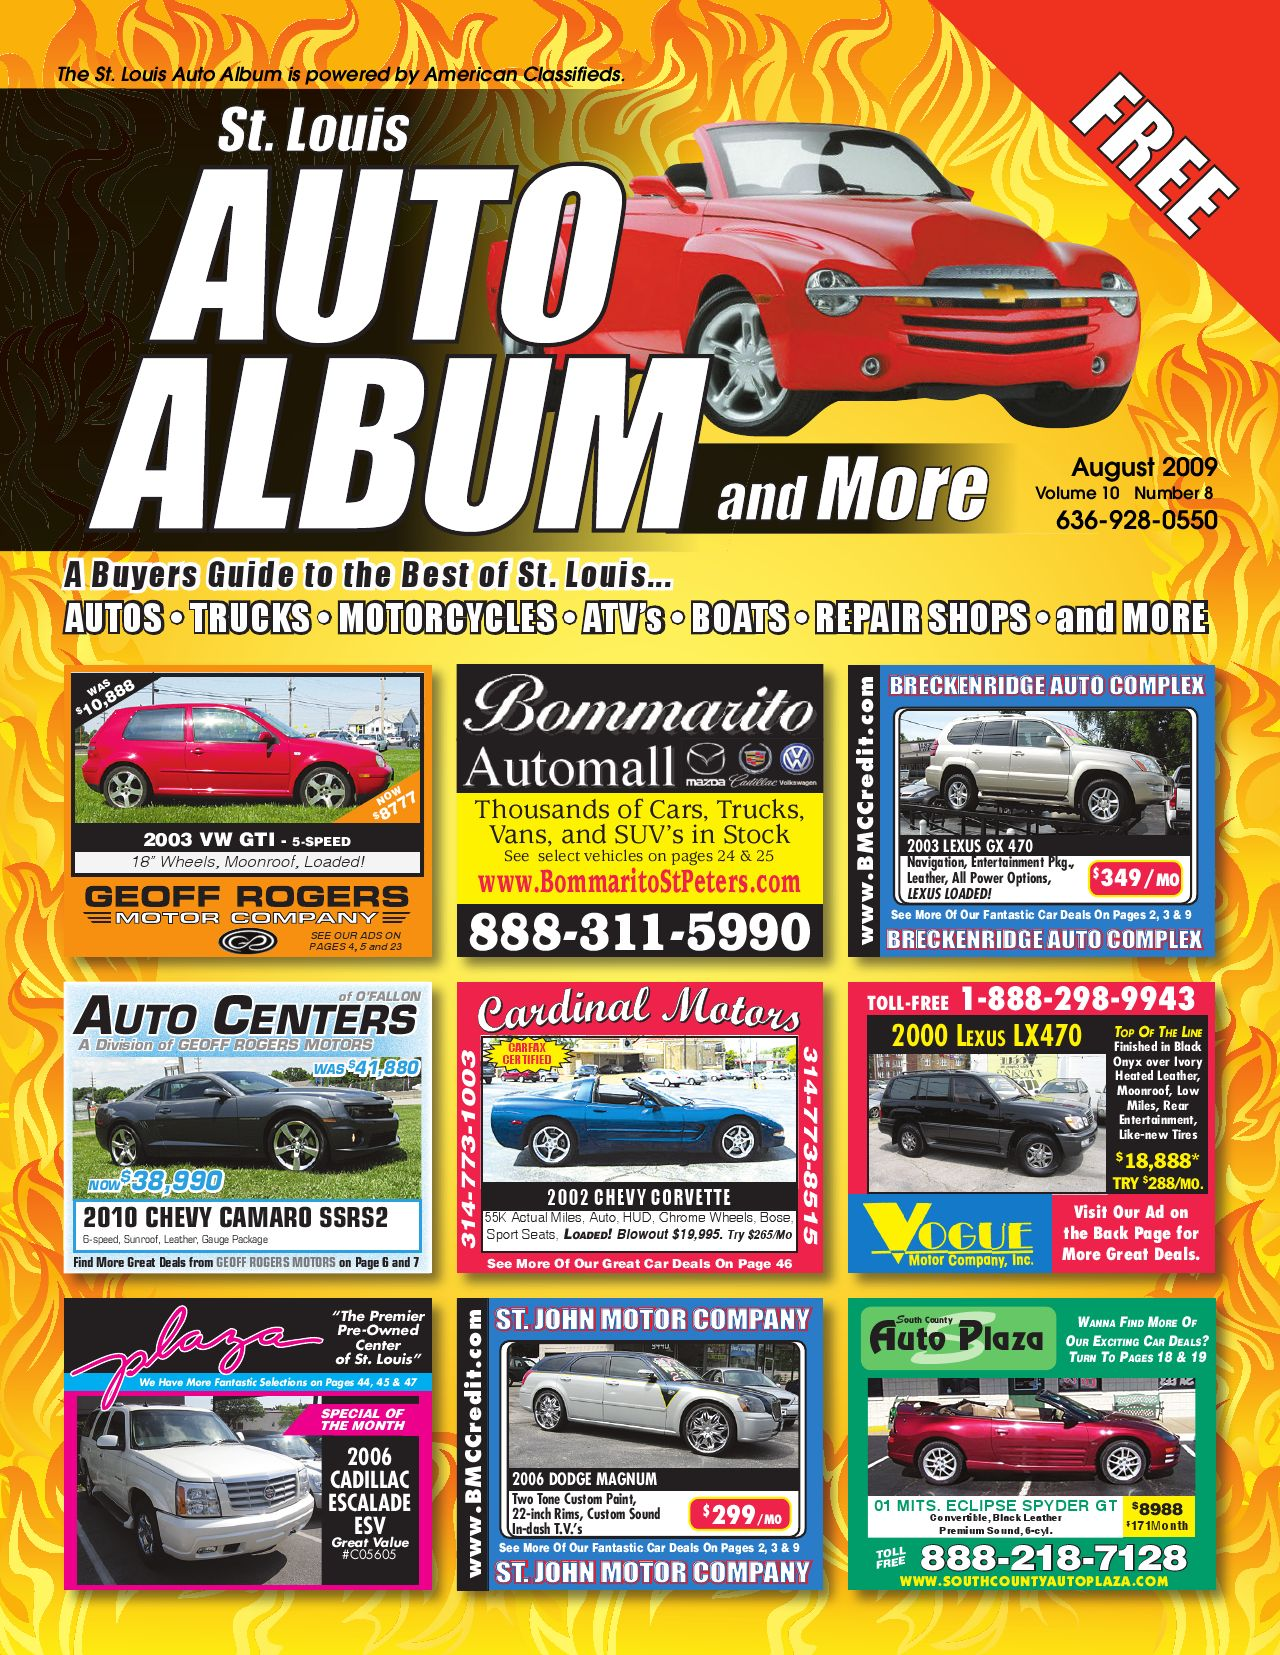 St Louis Auto Album August 2009